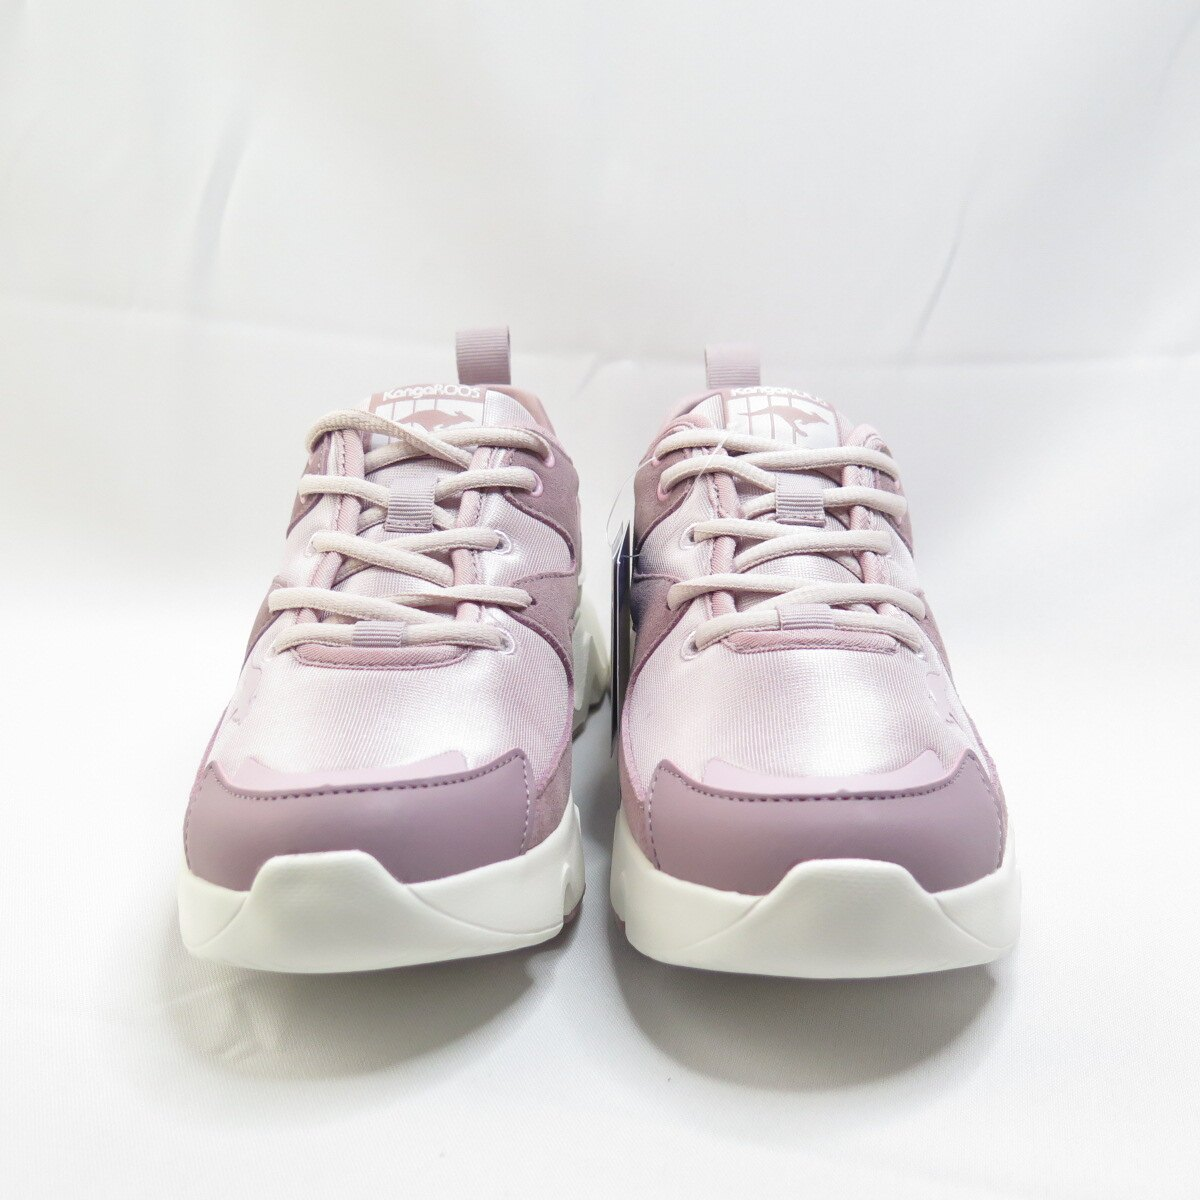 KangaROOS 袋鼠 GROOVE II 復古休閒鞋 KW11263 女款 粉【iSport愛運動】